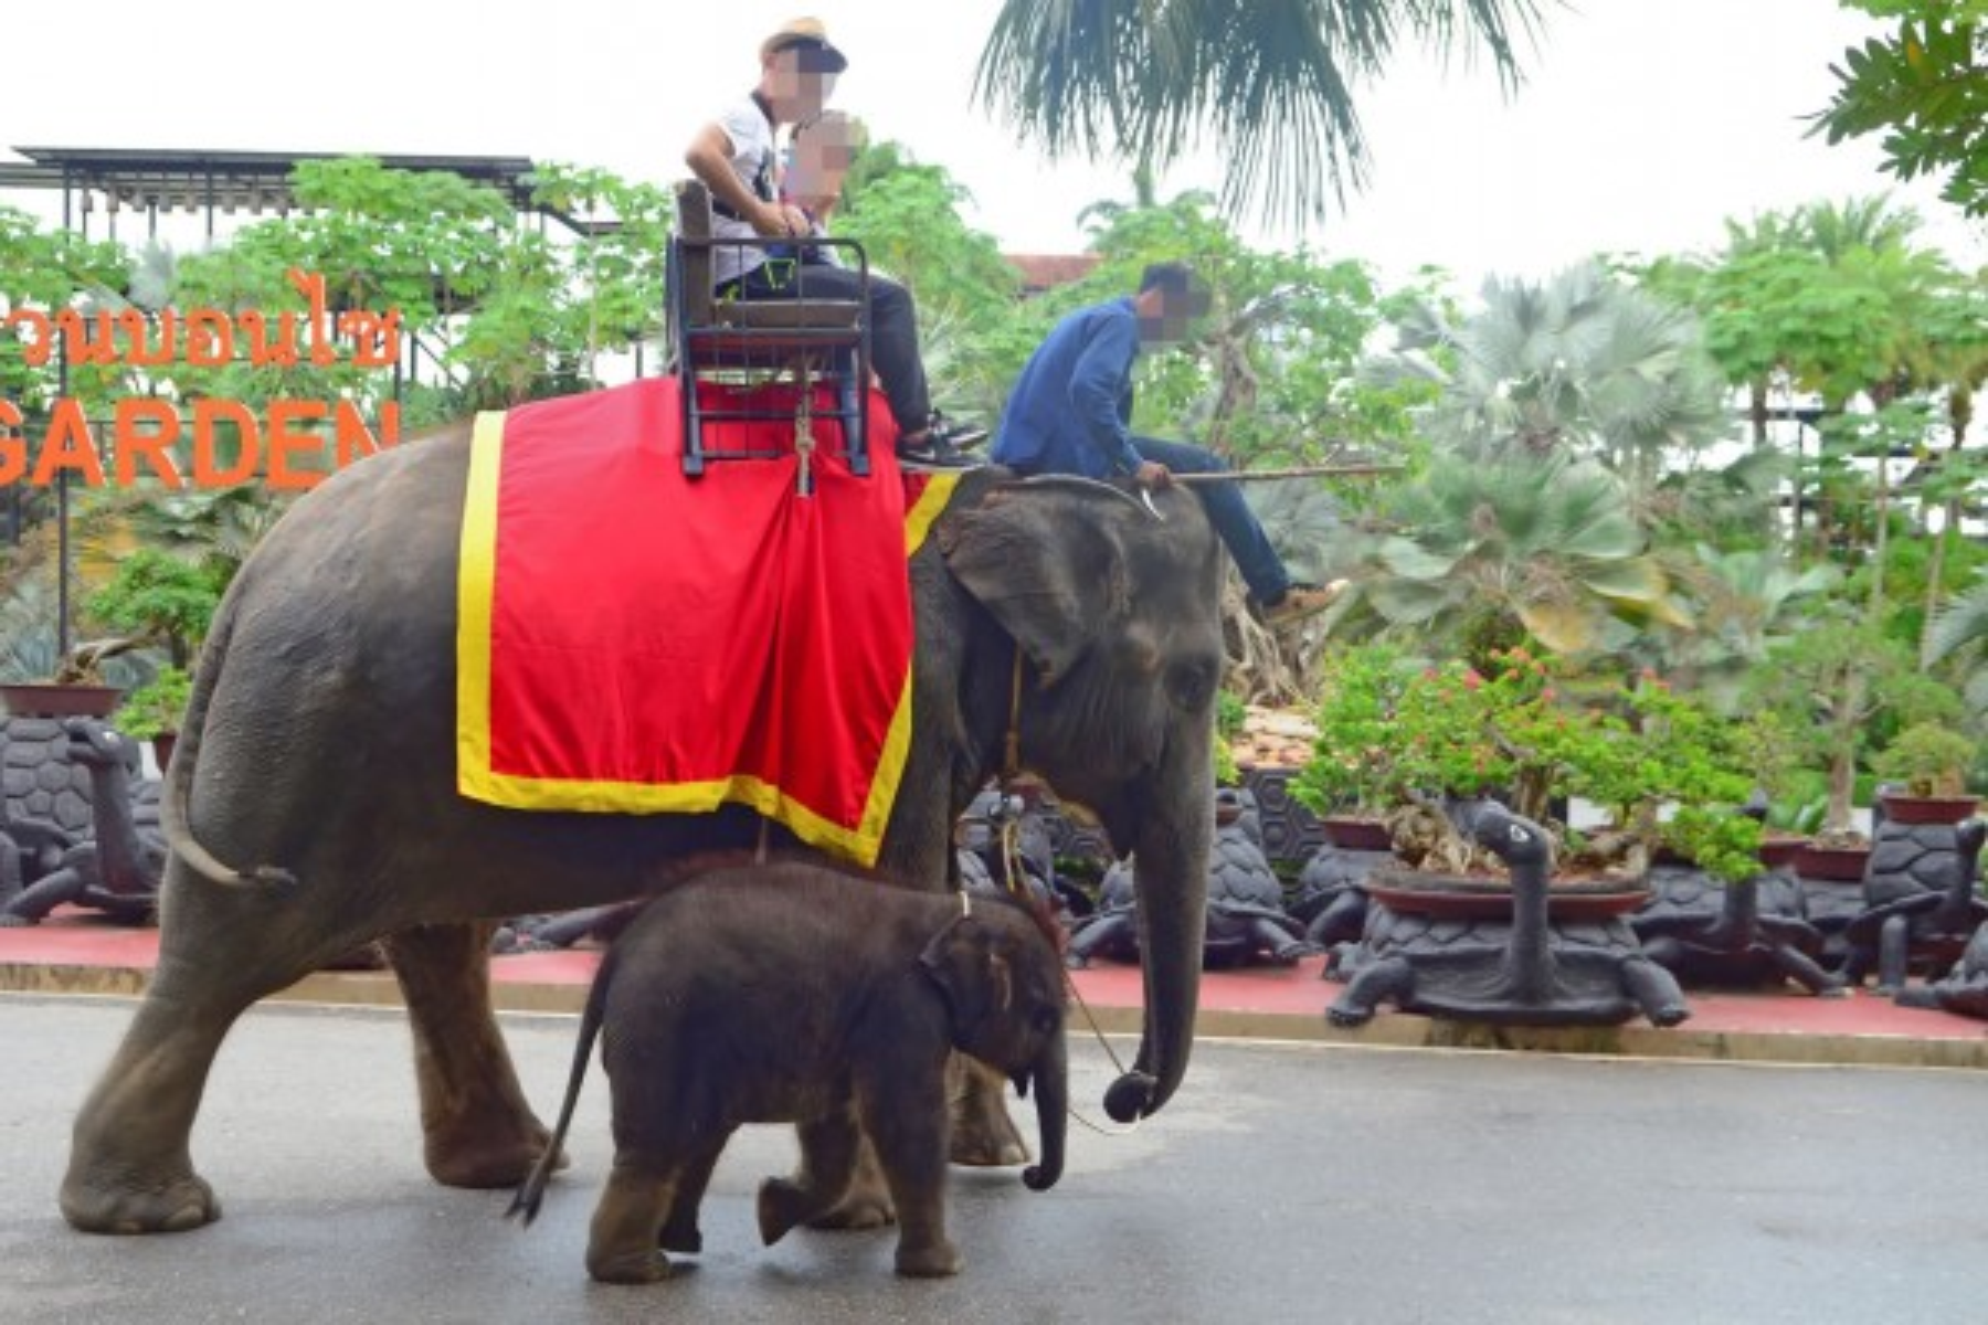 Baby elephant in a low welfare venue